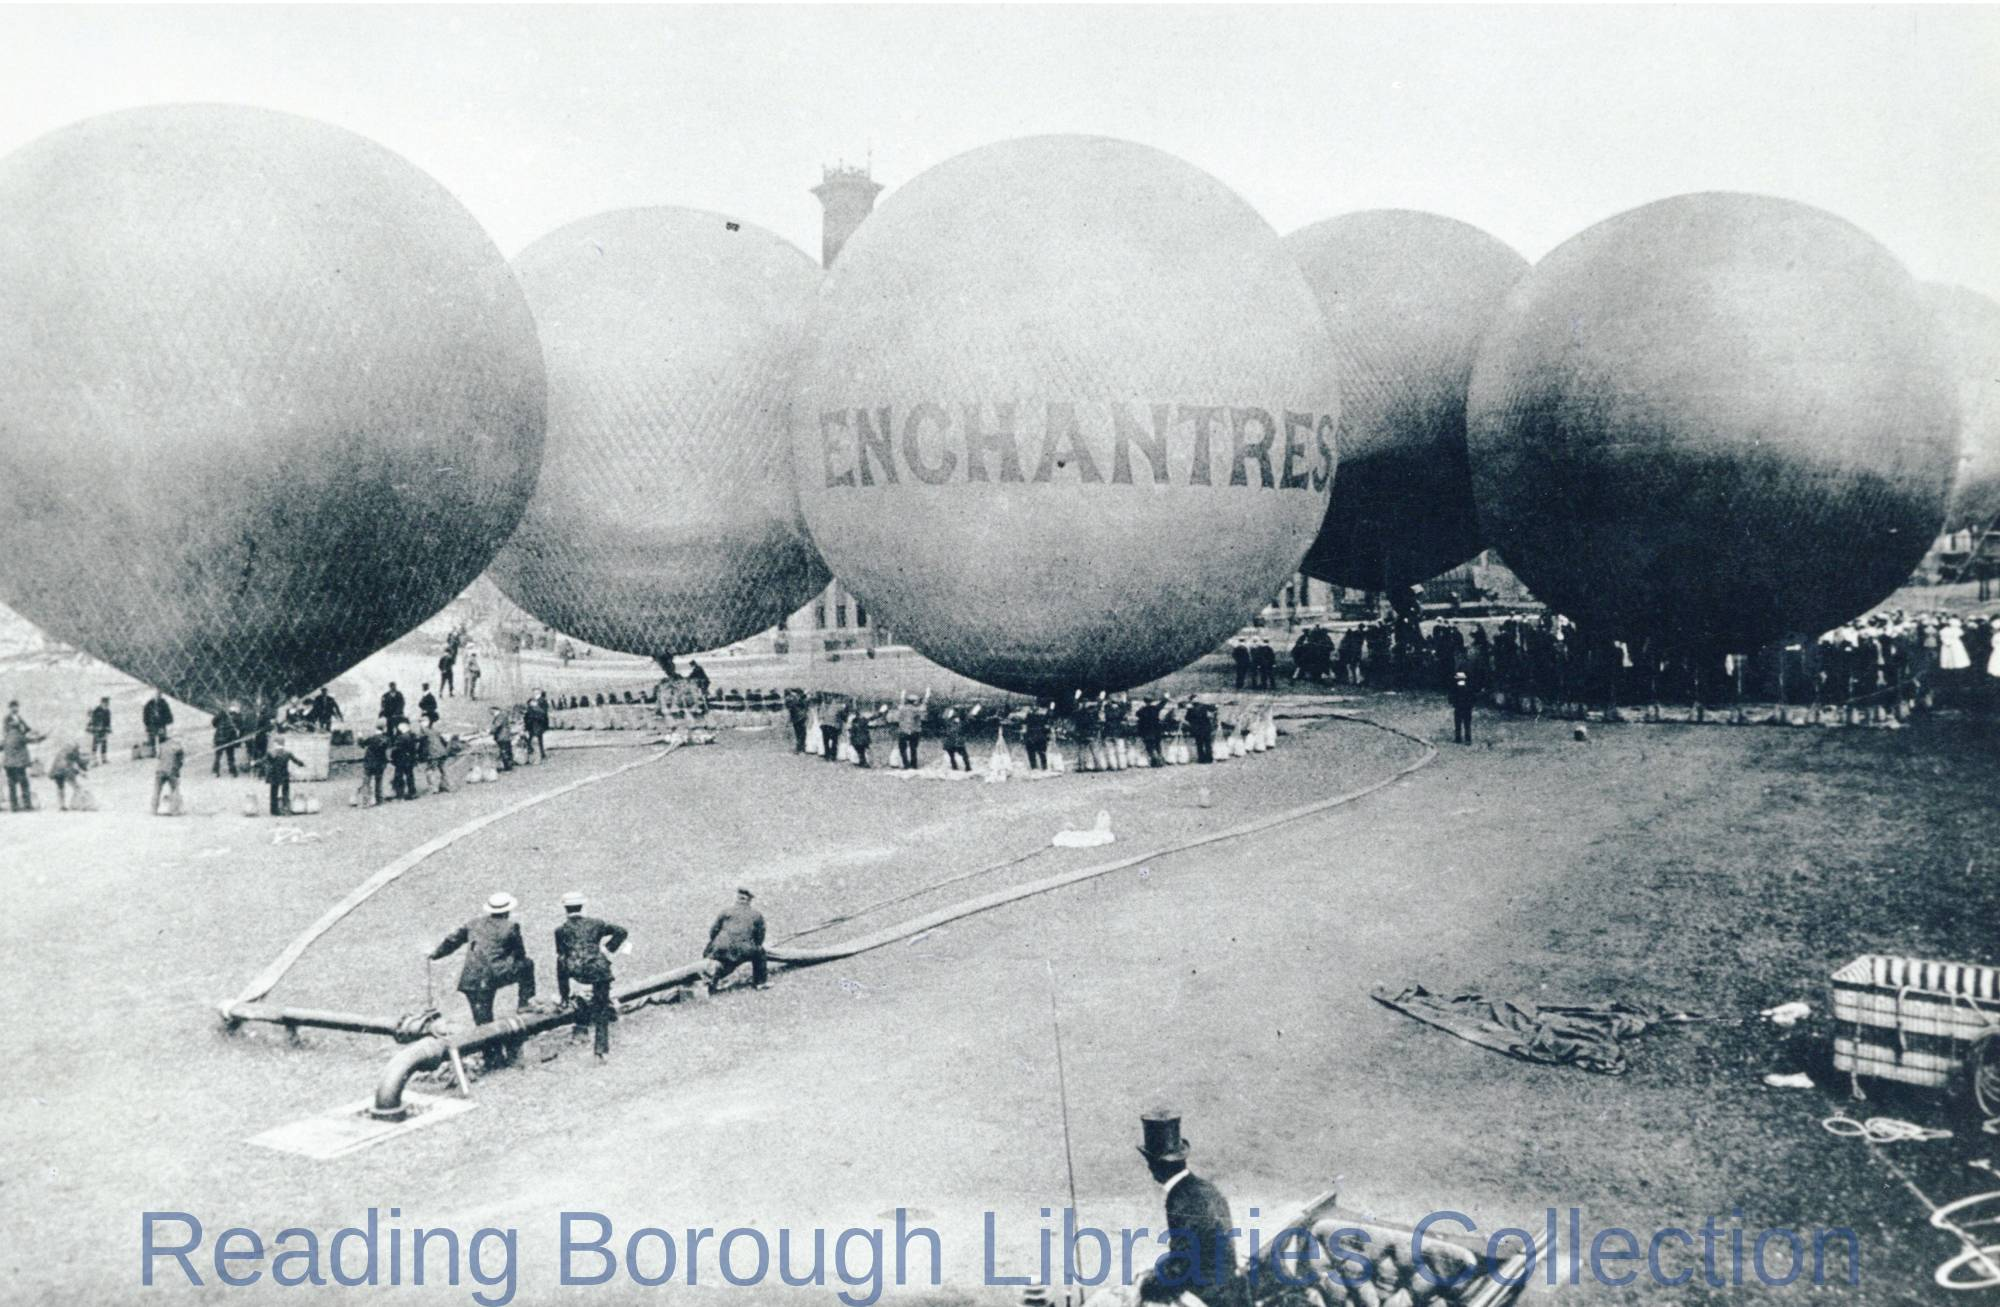 The Royal Aero Club Balloon Rally at Reading Gasworks, June 1906.